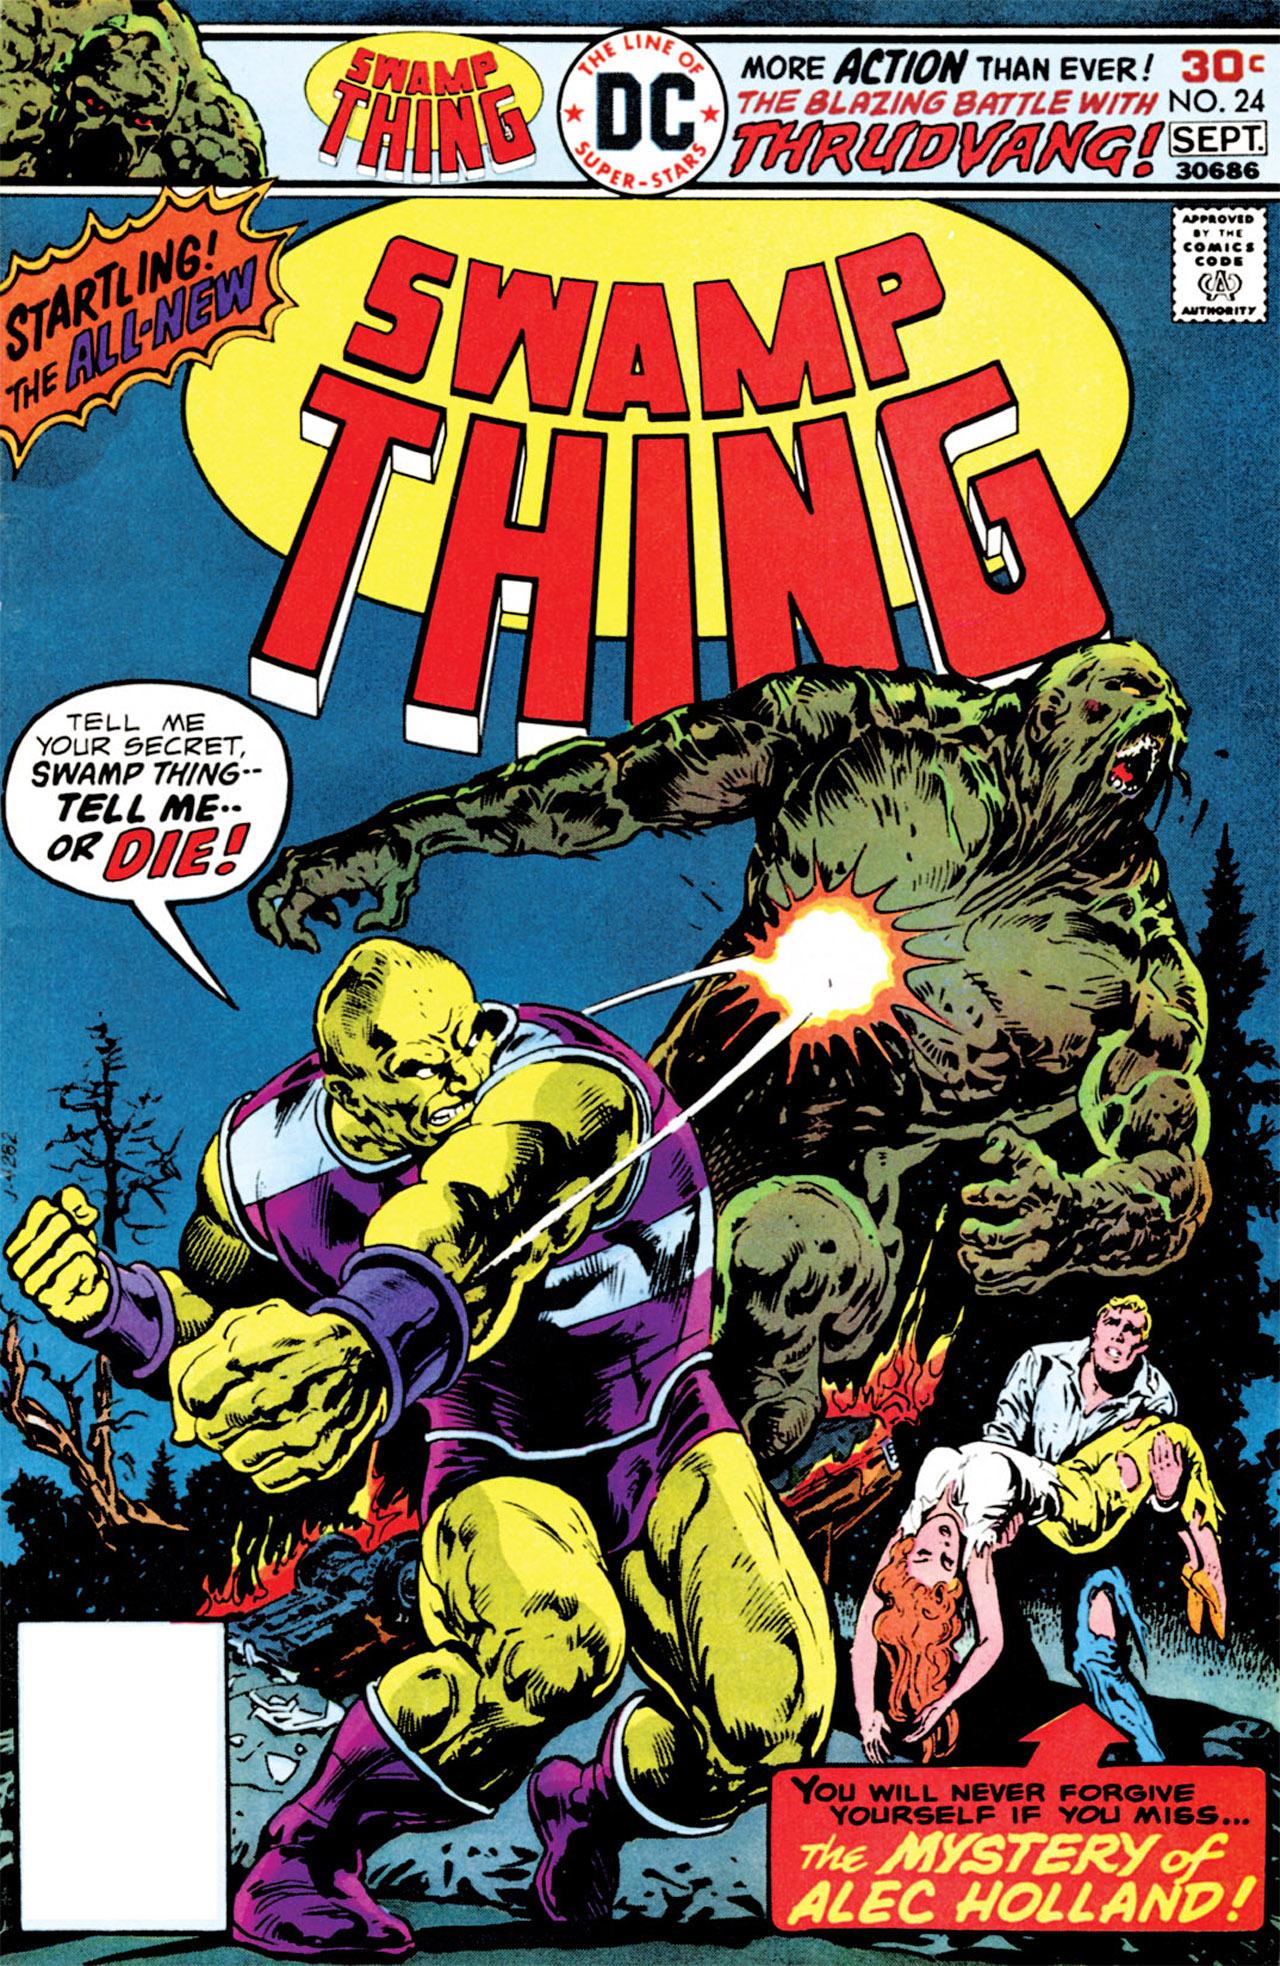 Swamp Thing (1972) #24, cover by Joe Orlando, logo by John Workman.